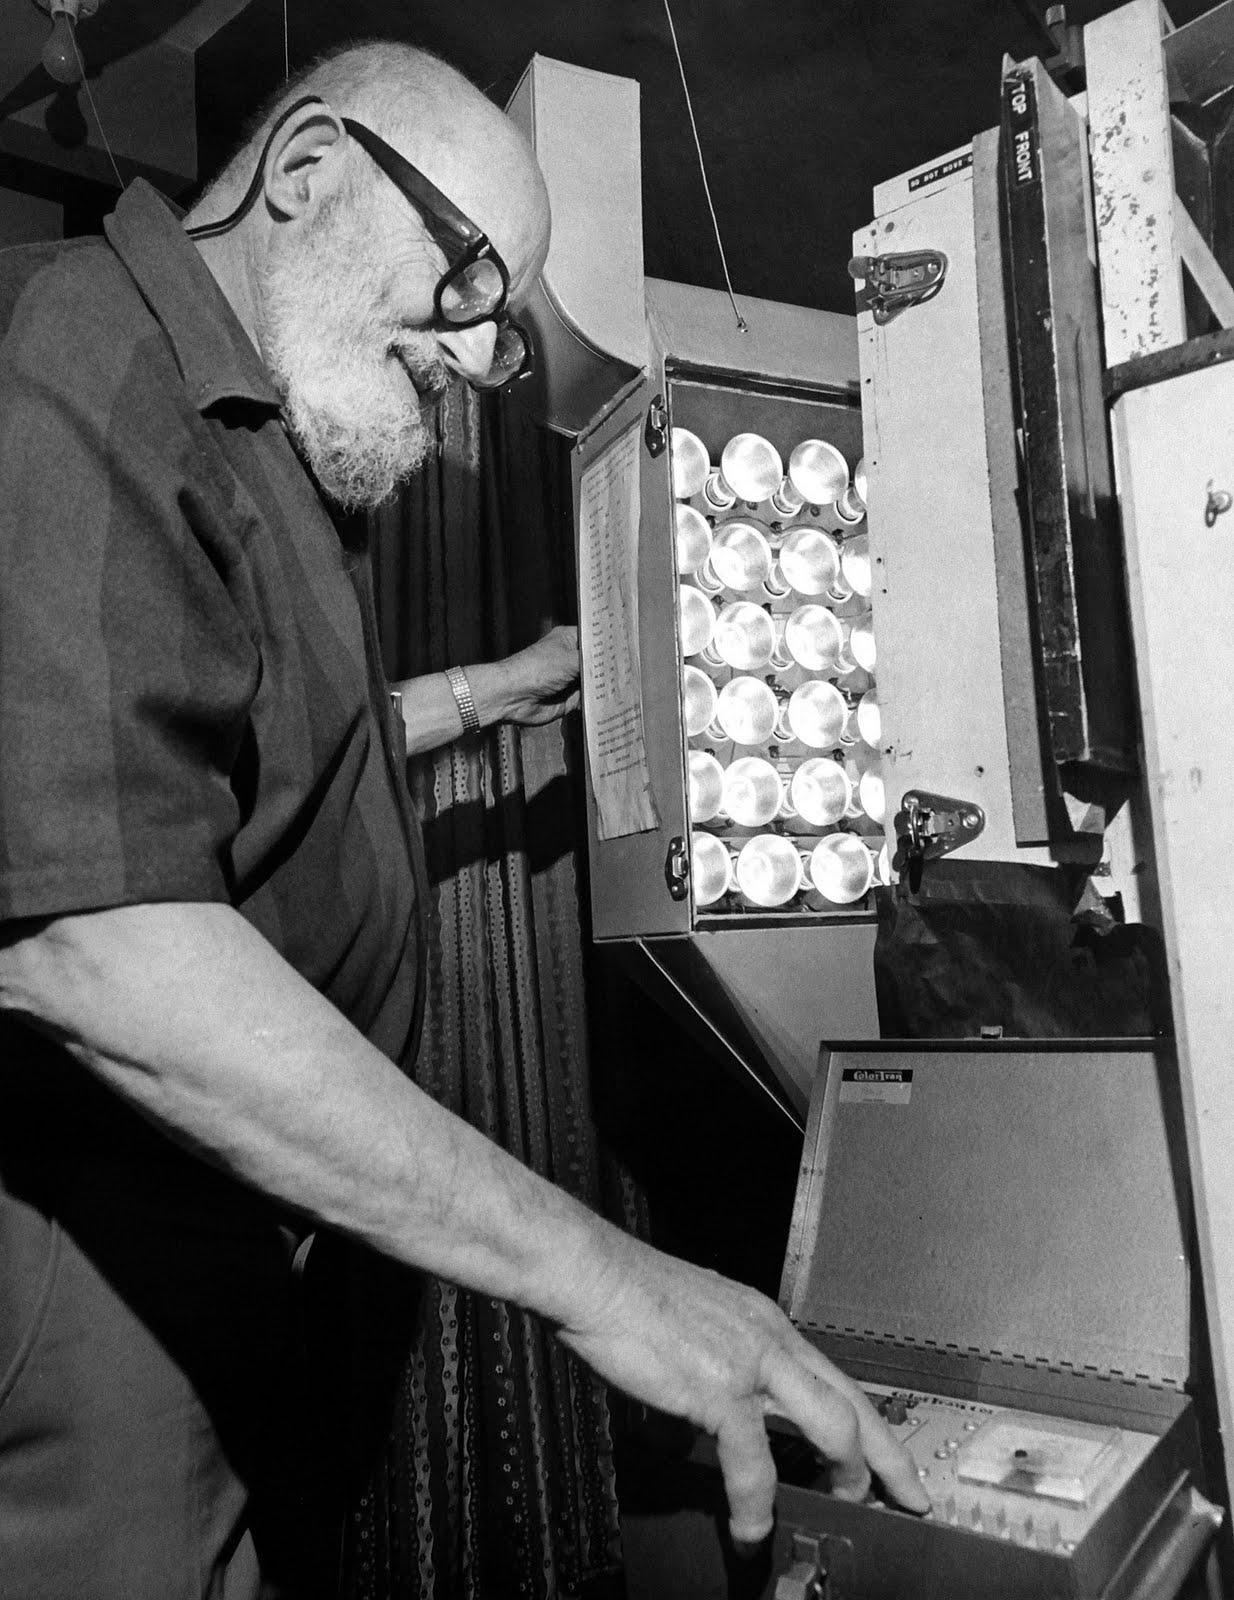 Ansel Adams in his personal darkroom